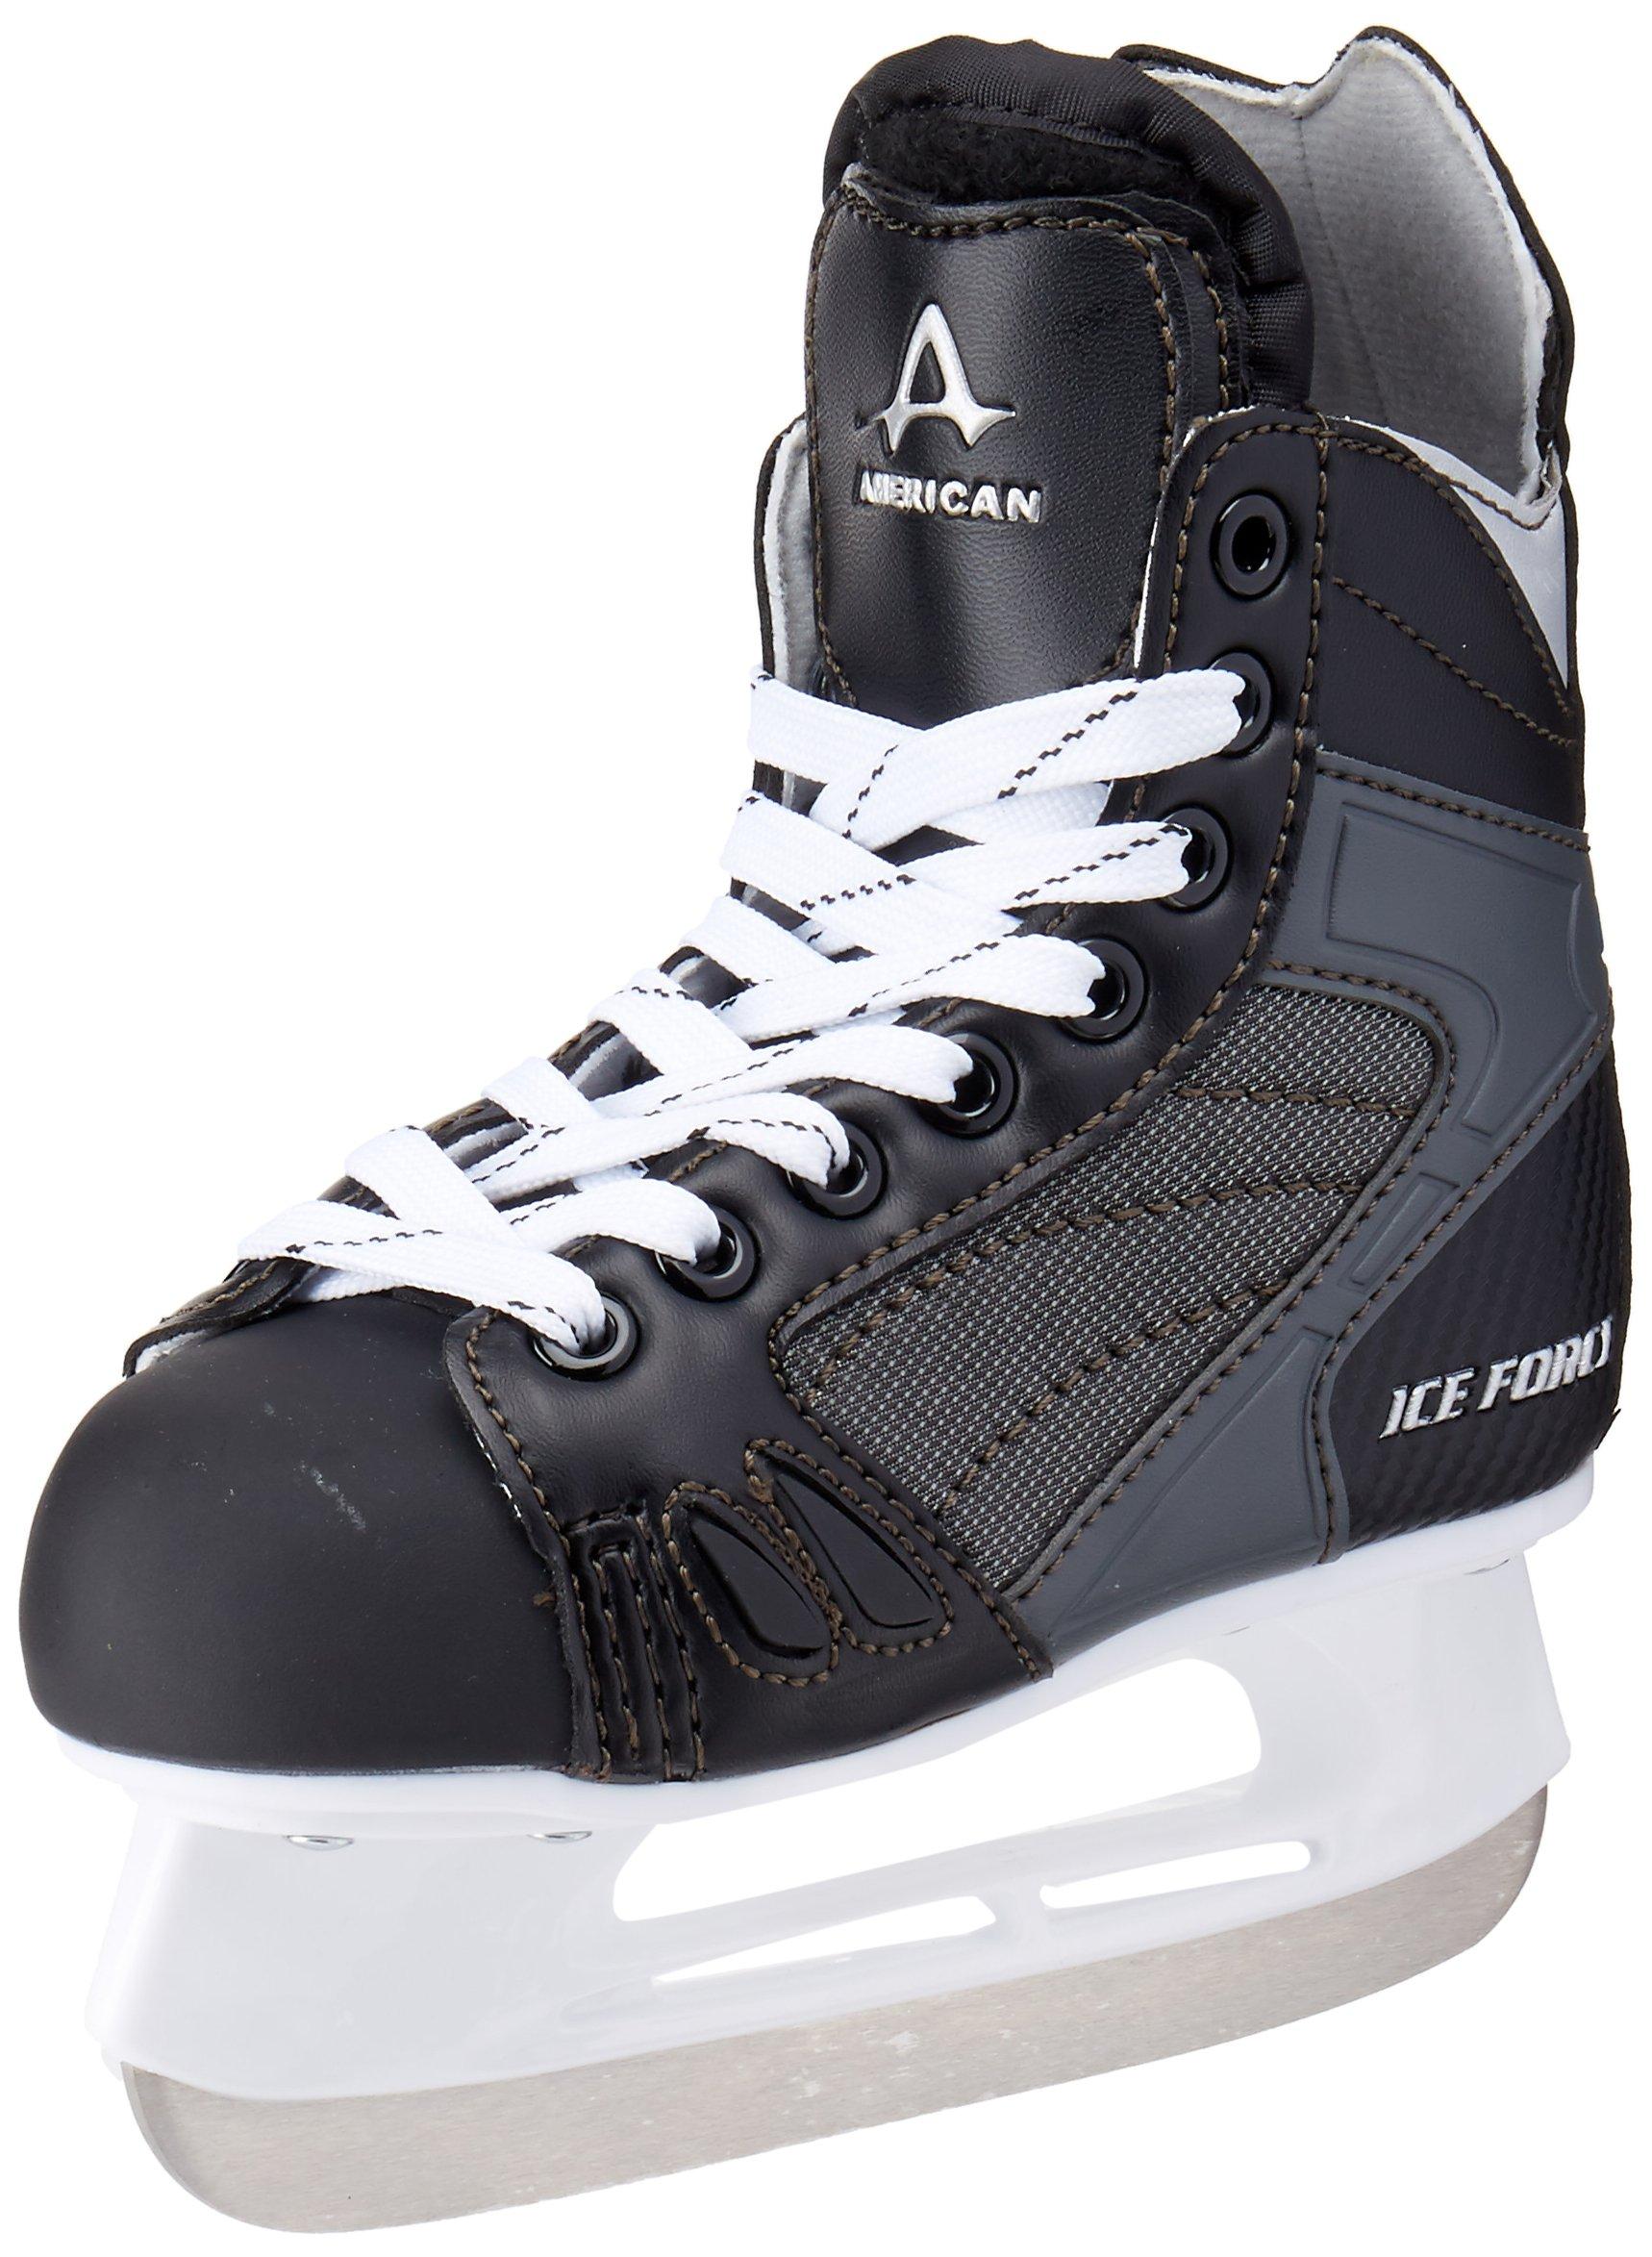 American Athletic Shoe Boy's Ice Force Hockey Skates, Black, 1 Y by American Athletic